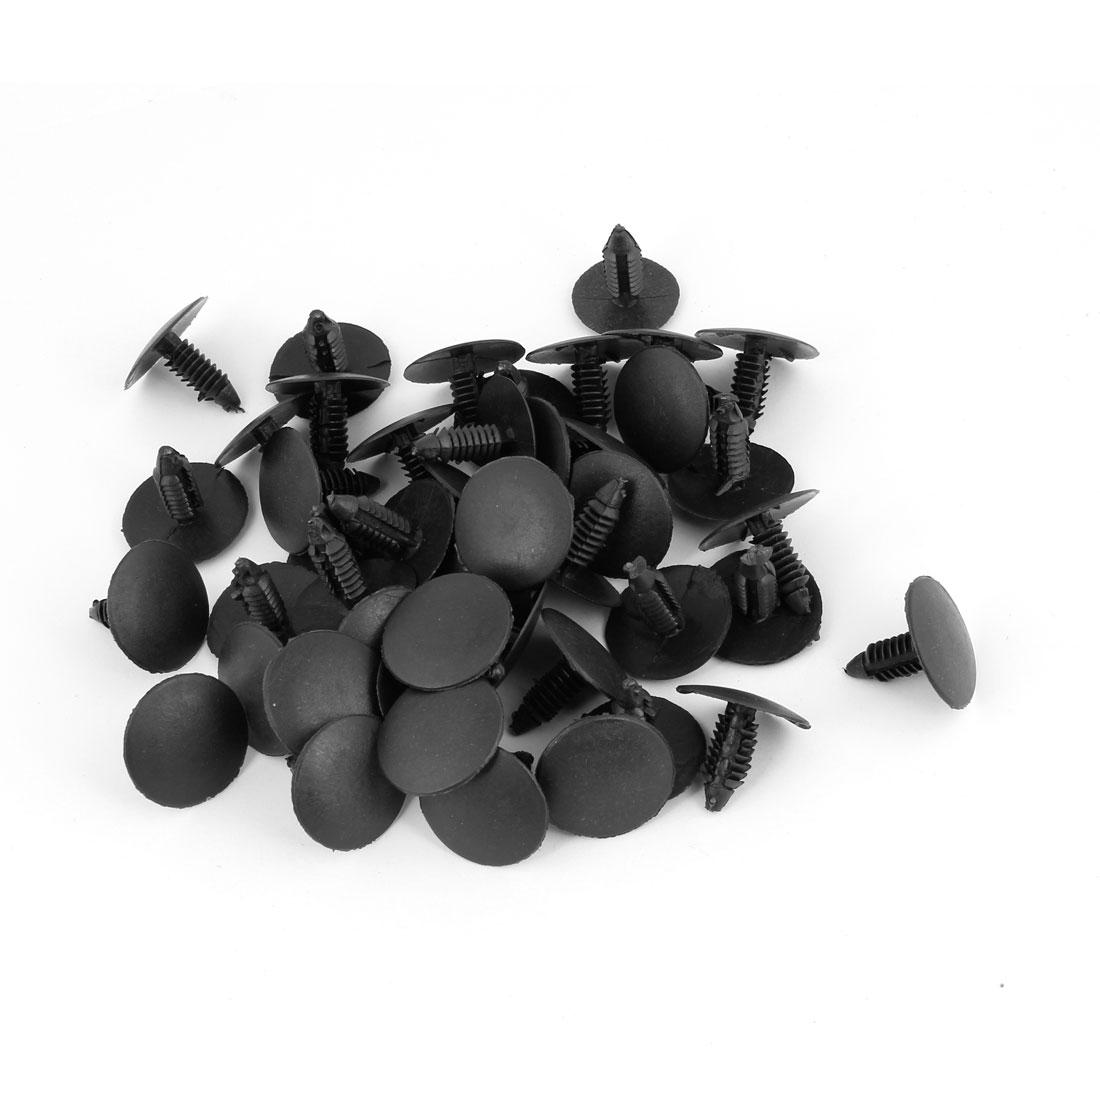 50 Pcs Plastic Fastener Rivet Retainer Hood Insulation Clips Black